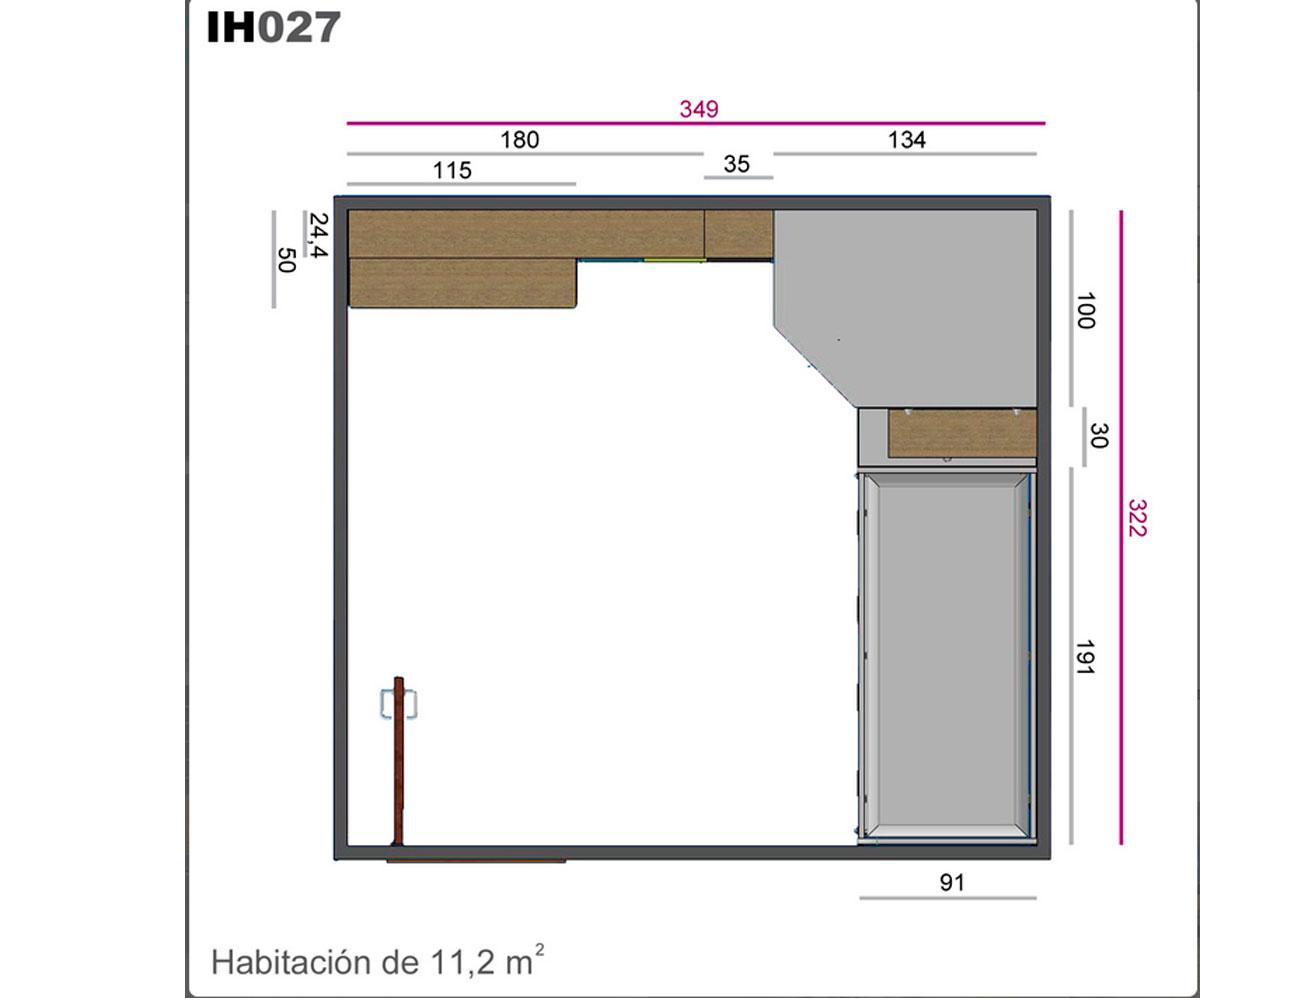 Ih027 medidas